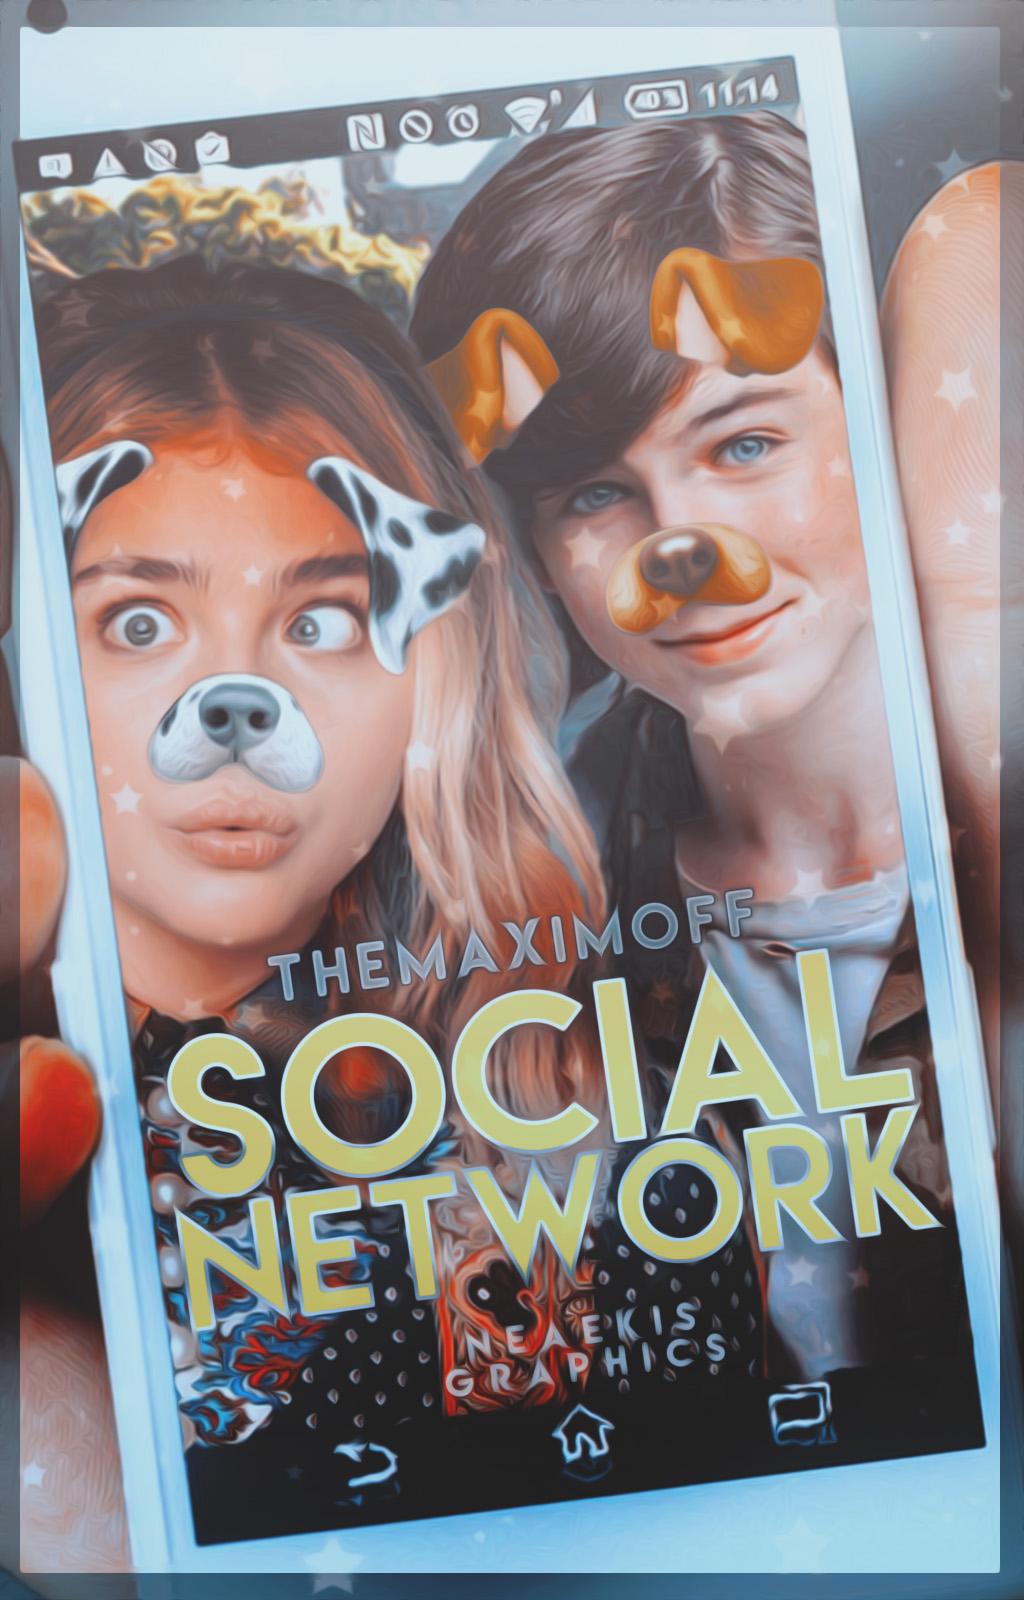 Wattpad Book Cover Resources : Social network wattpad cover by neaekis on deviantart